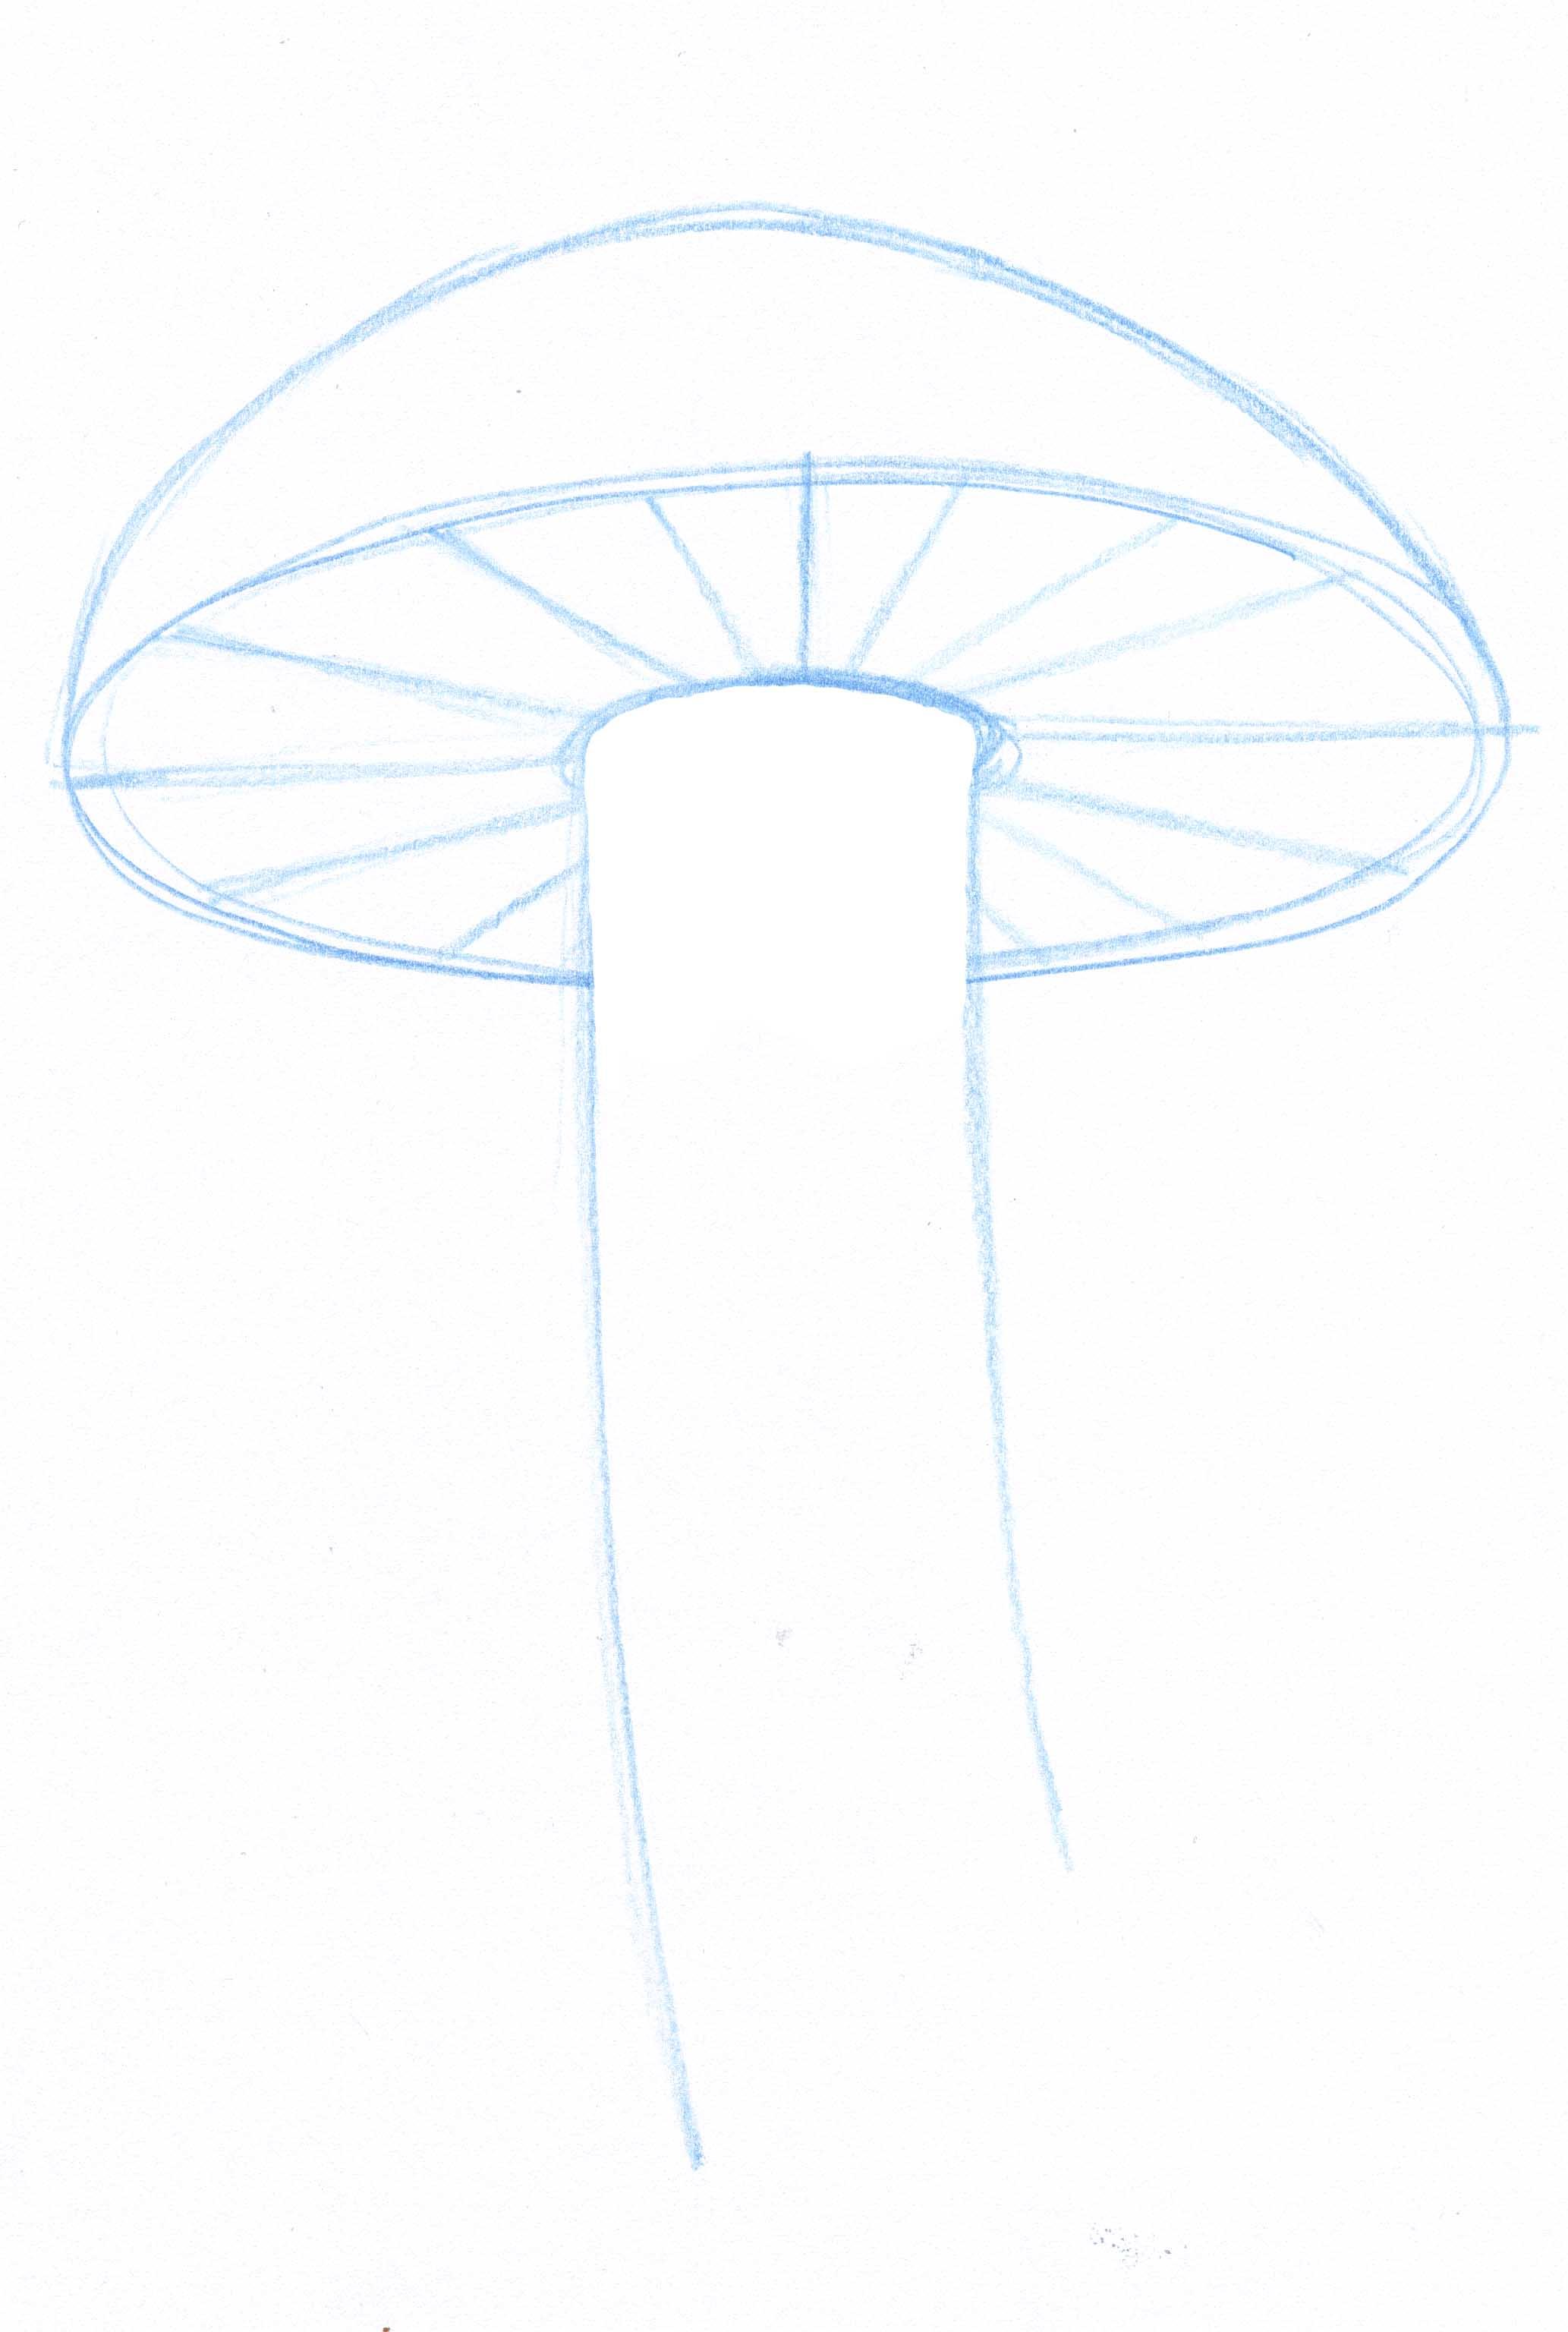 Drawing Lines Visual Basic : Erase inside the stipe john muir laws